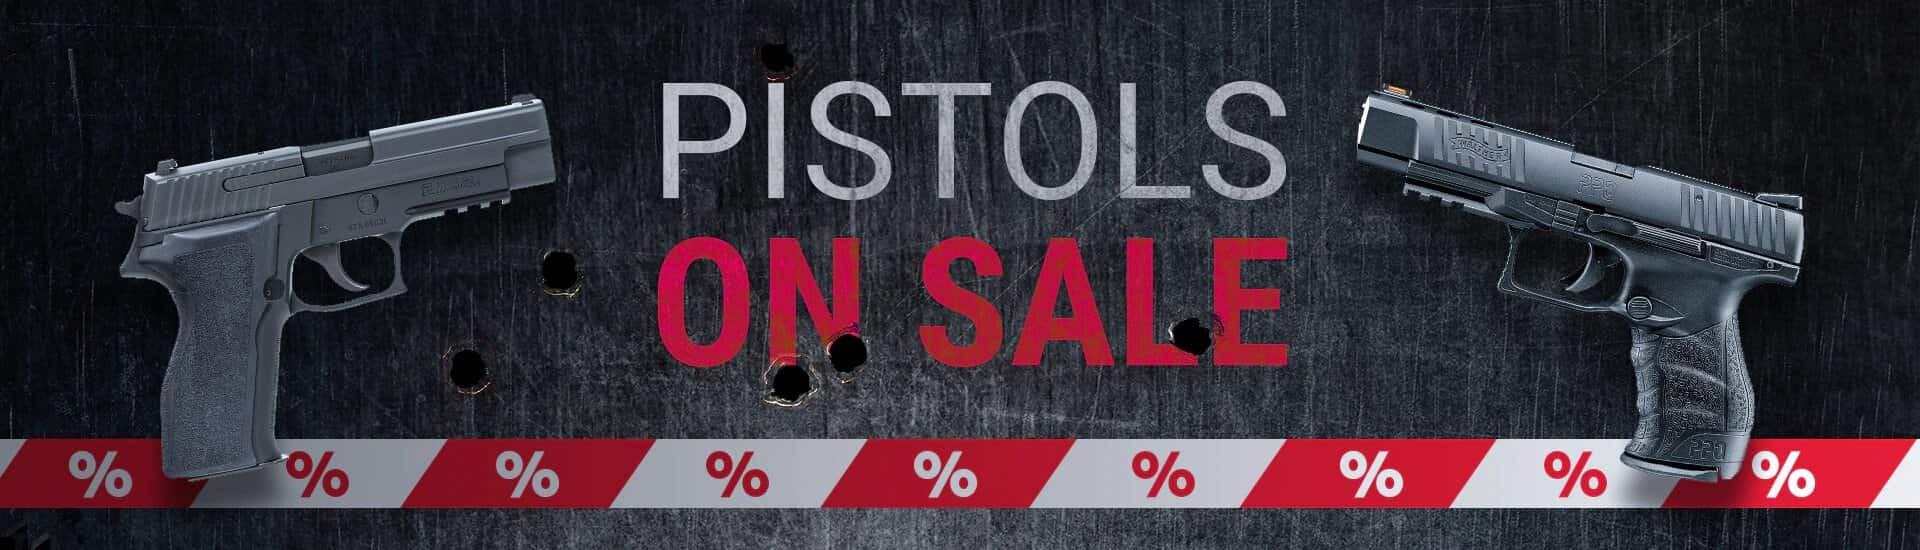 Pistols on Sale